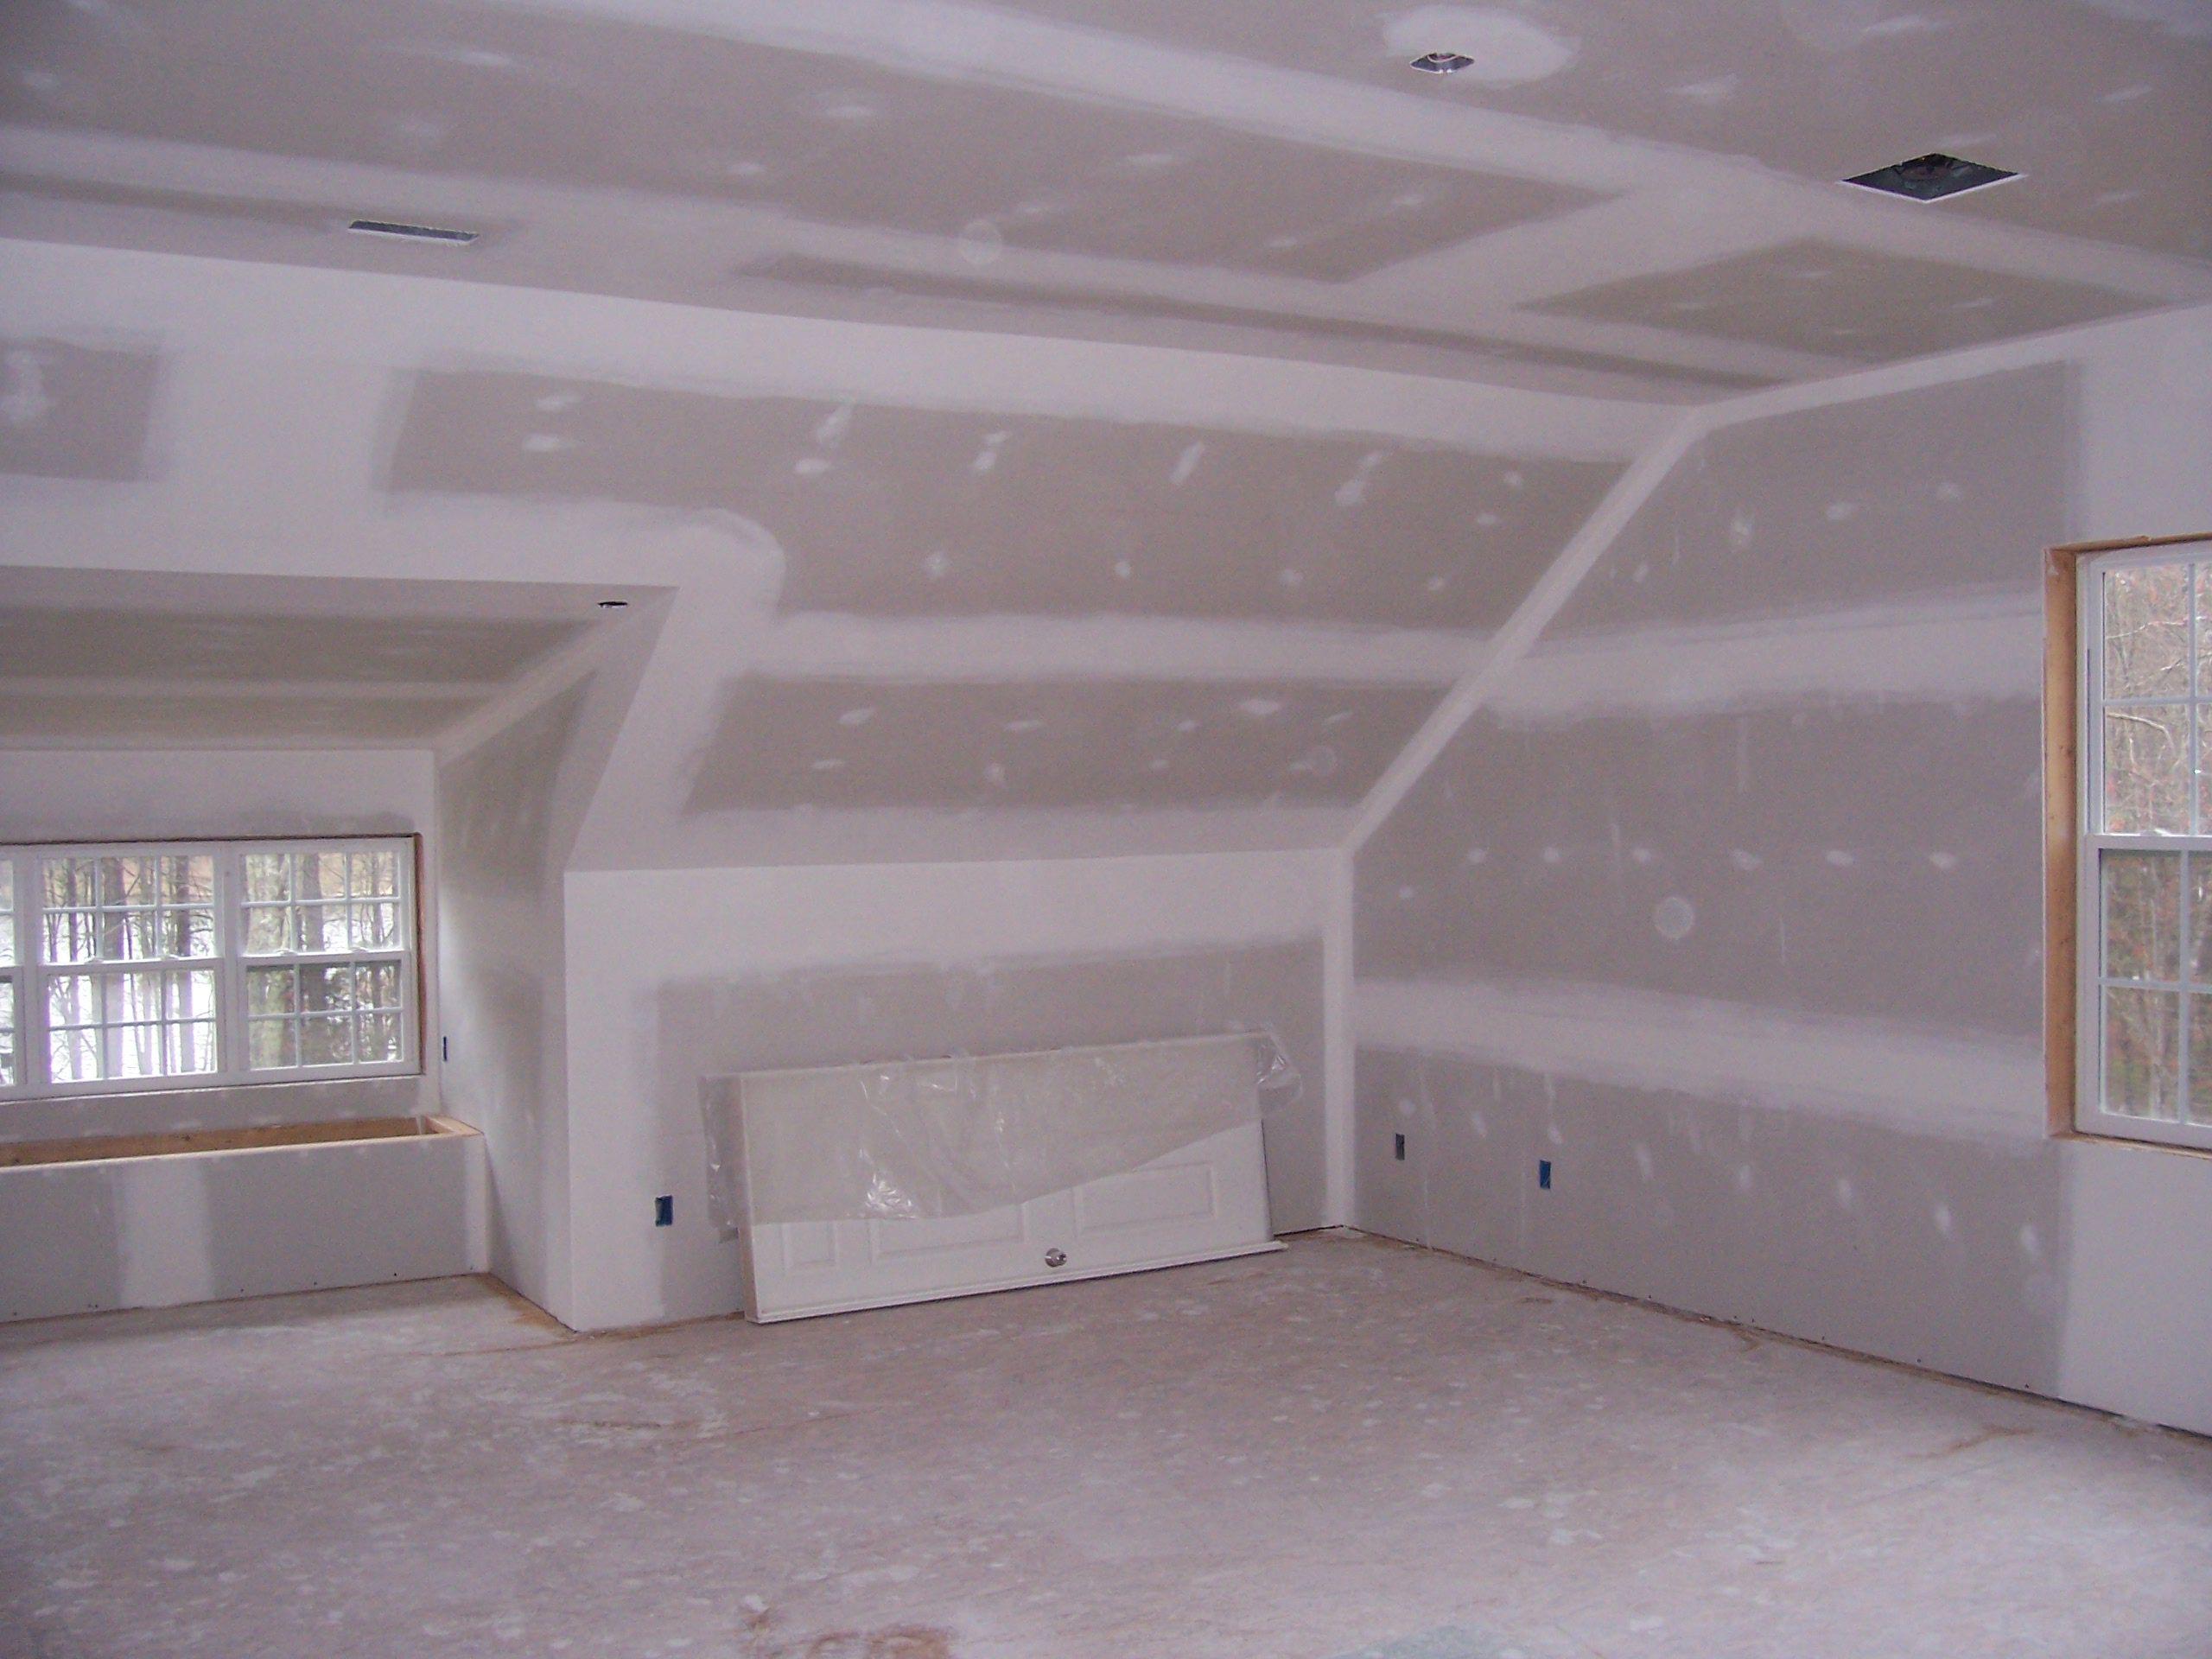 Attic remodel ideas for the attic room pinterest for Attic remodel